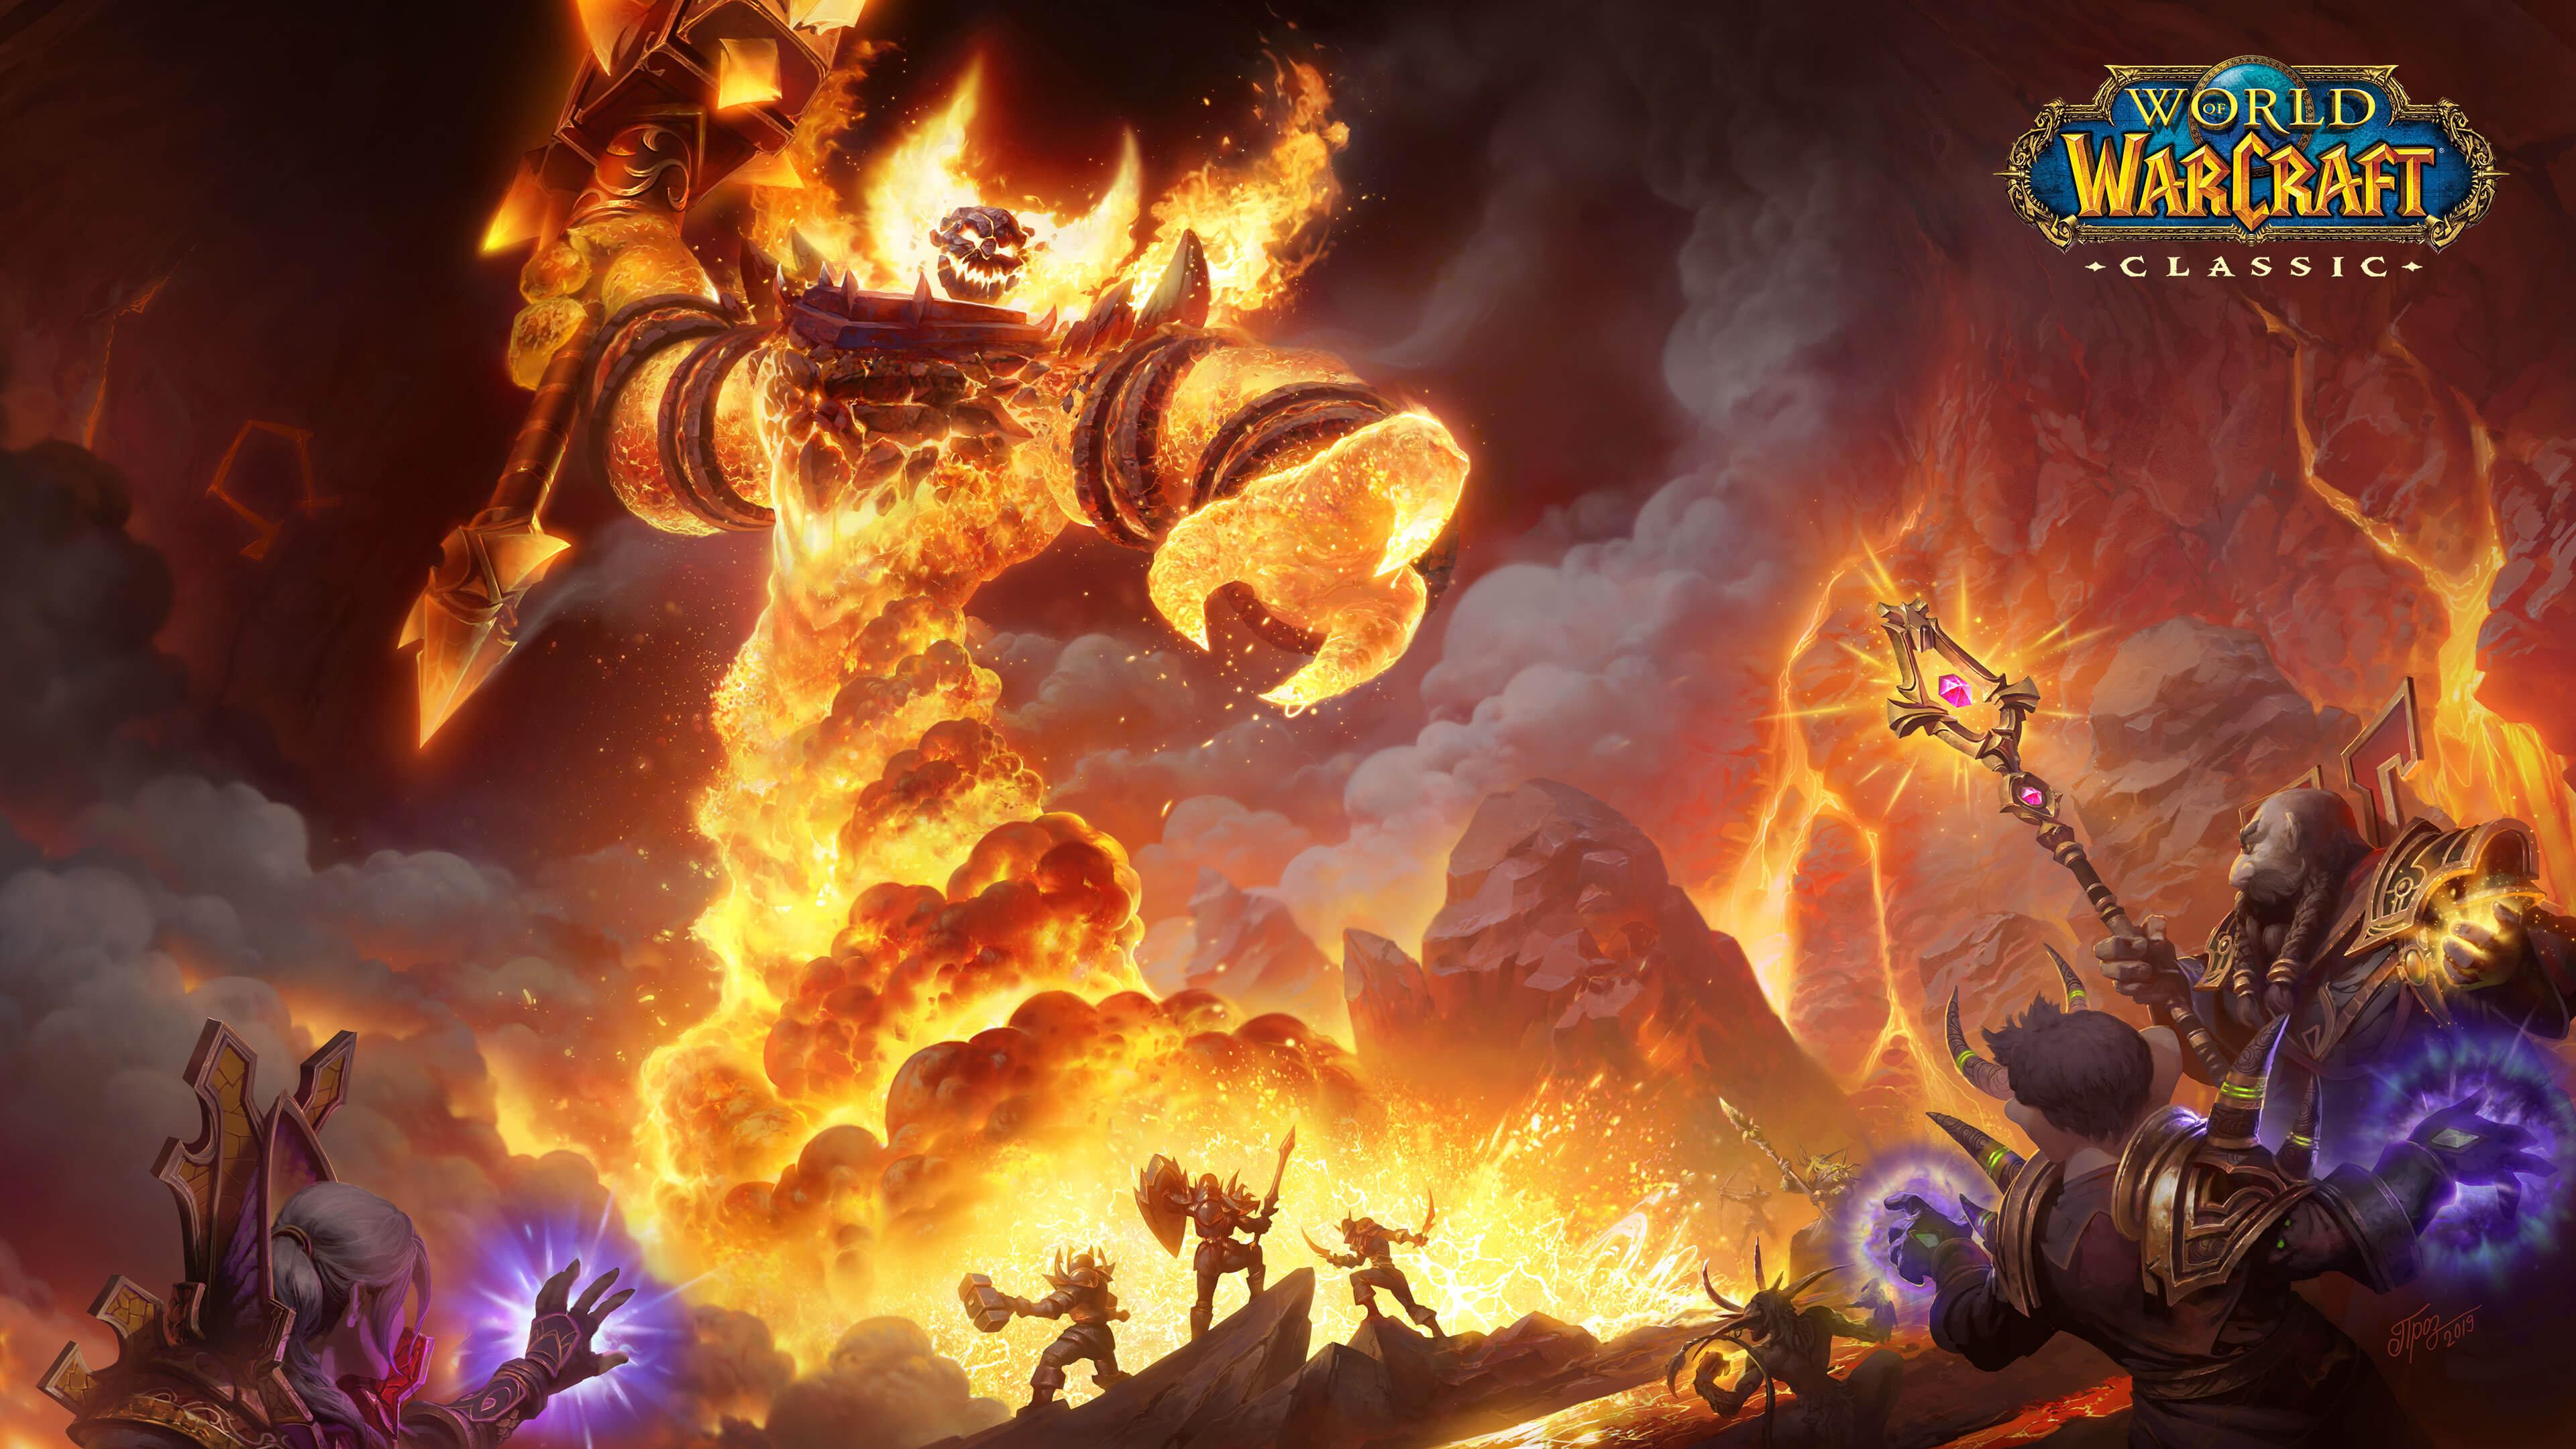 world of warcraft classic raid uhd 4k wallpaper